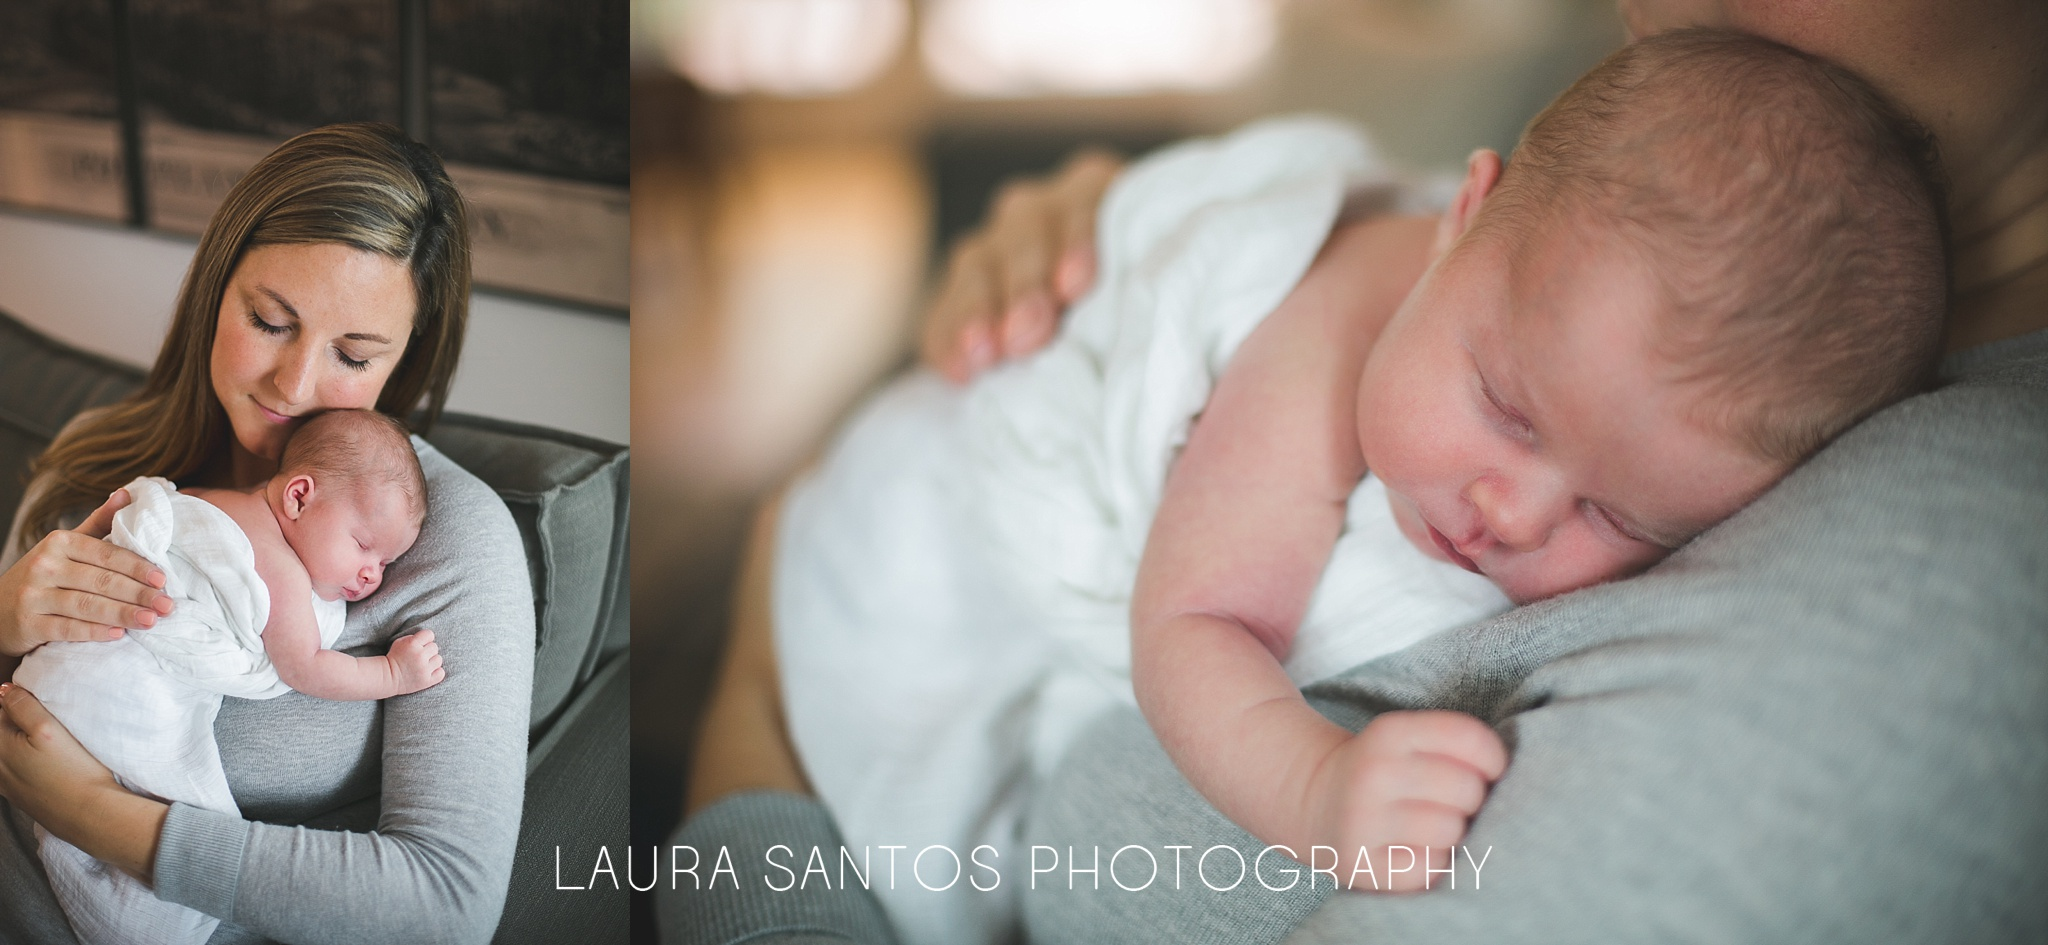 Laura Santos Photography Portland Oregon Family Photographer_0194.jpg